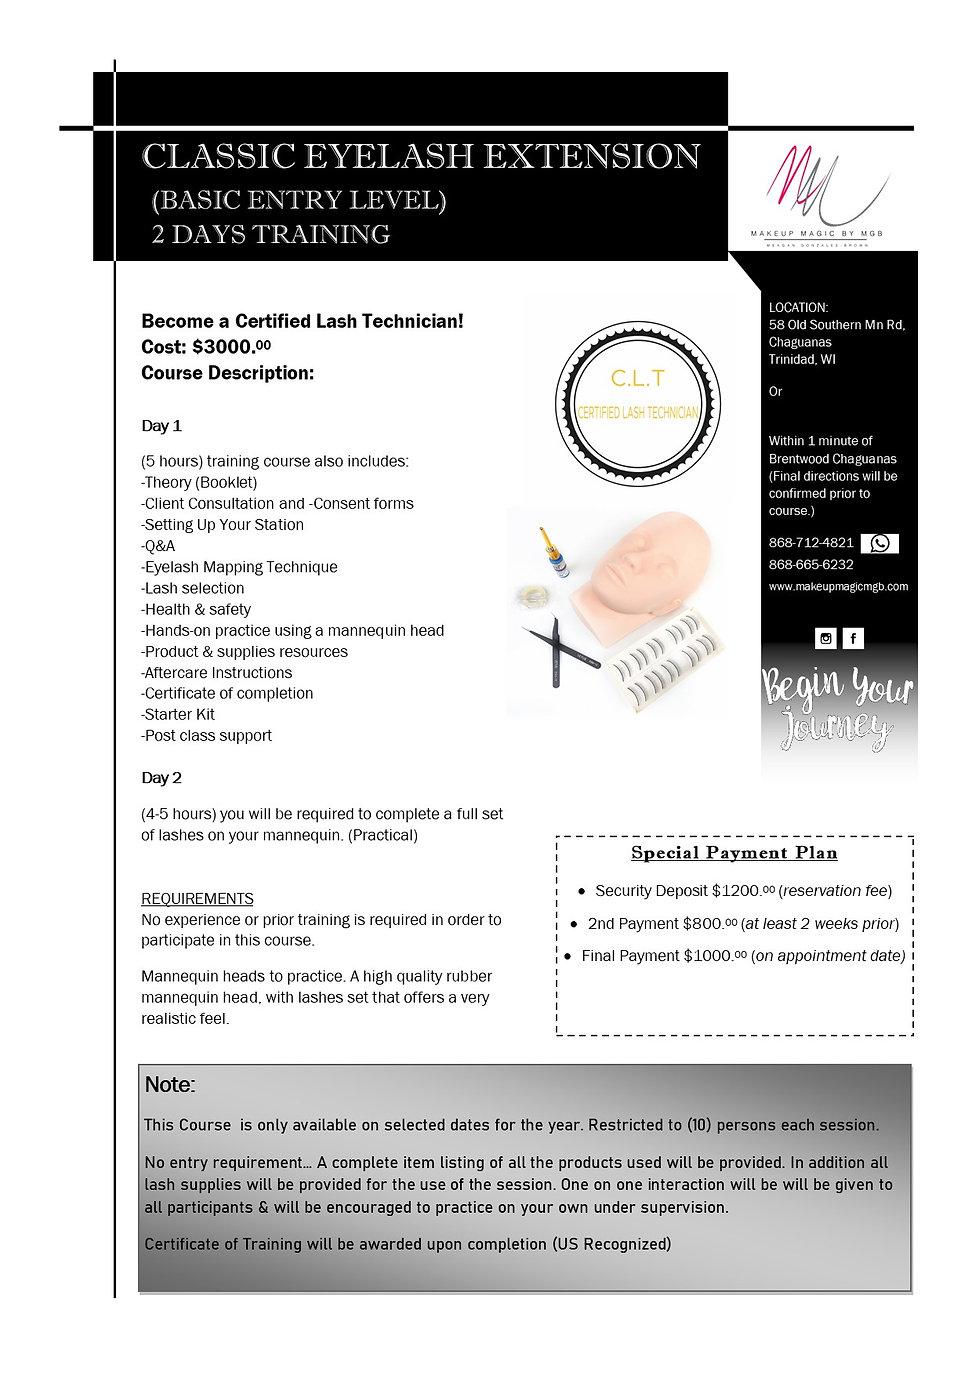 Classic Eyelash Extension Trinidad & Tobago / Lash Course Outline (Basic Entry).jpg